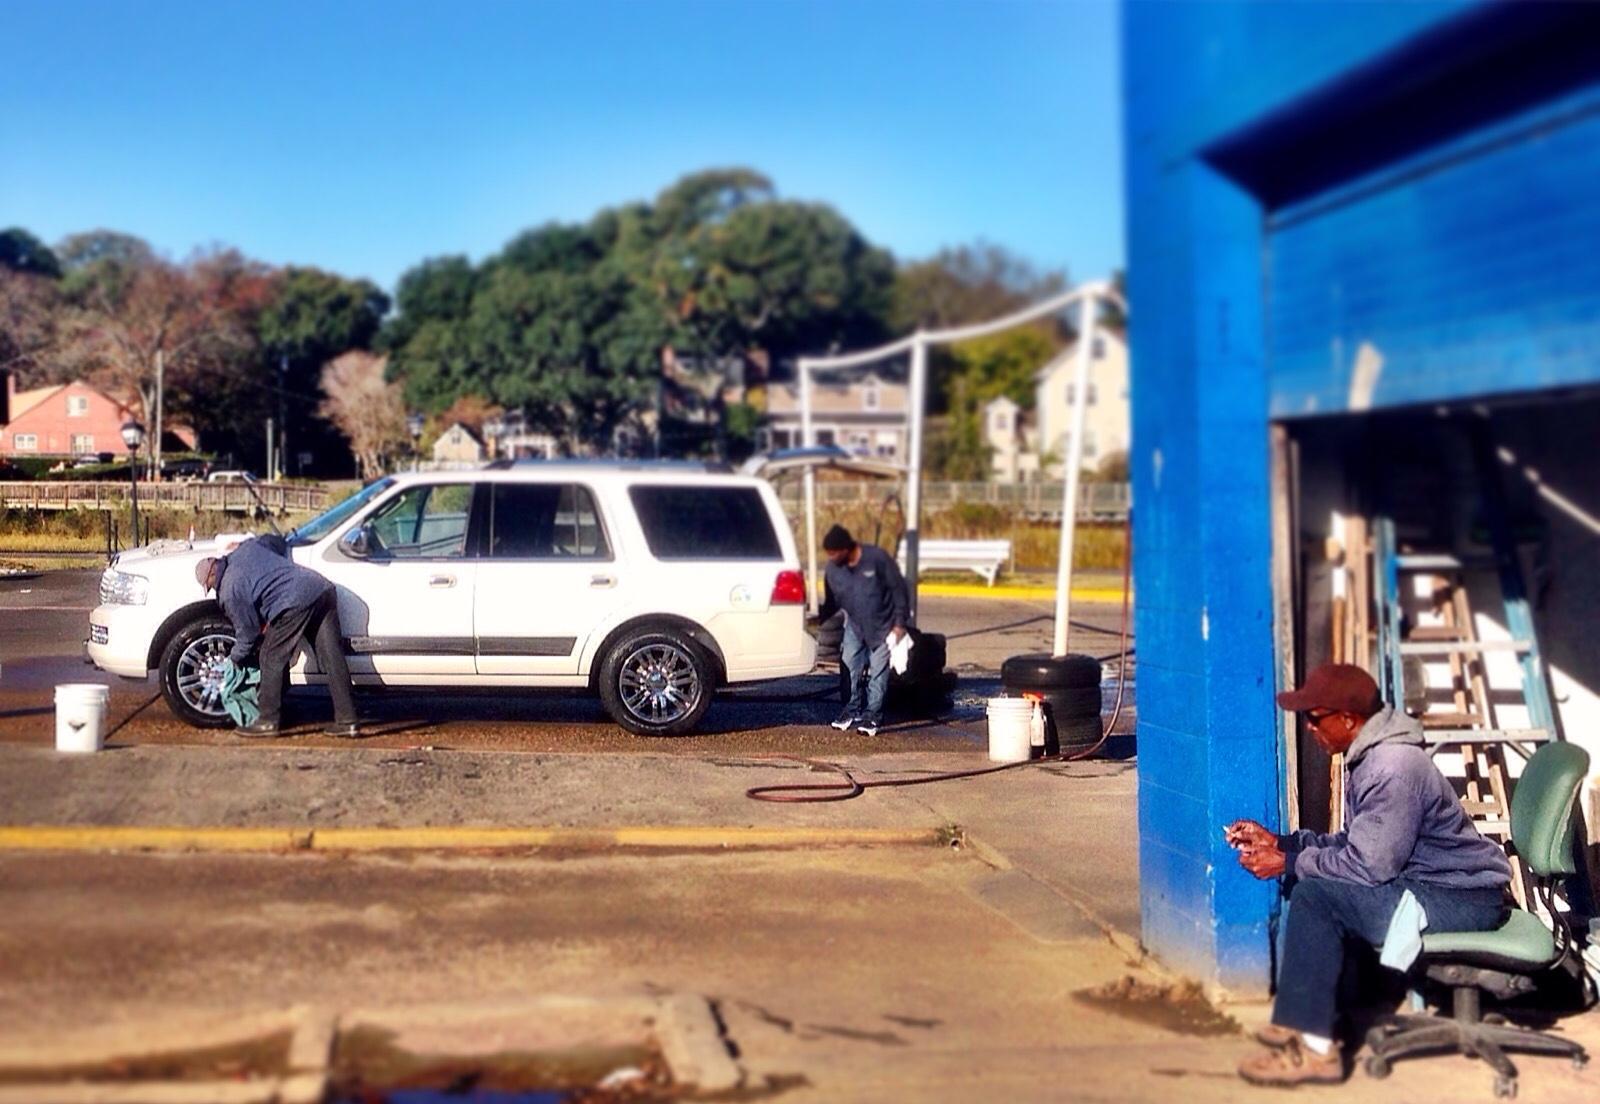 The car wash crew.